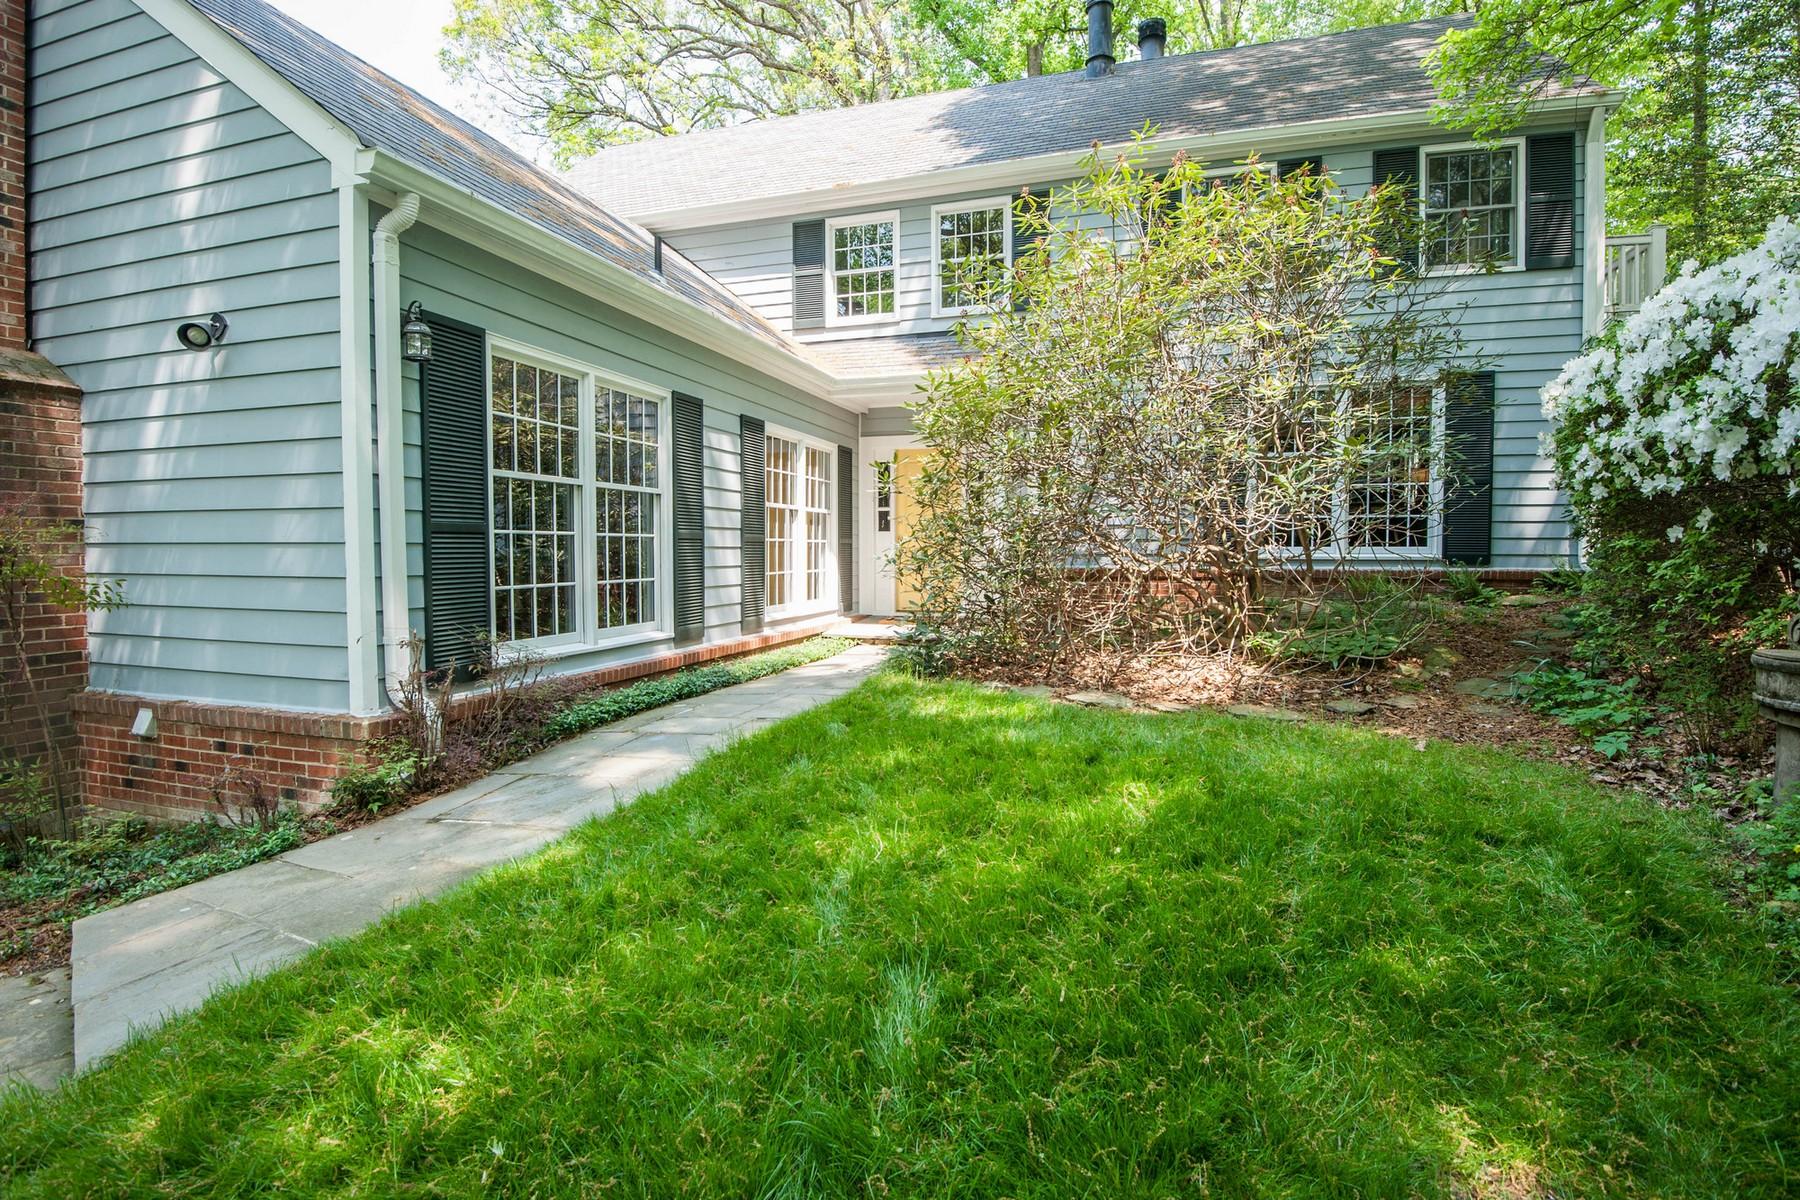 Nhà ở một gia đình vì Bán tại 907 Turkey Run Road, Mclean 907 Turkey Run Rd McLean, Virginia 22101 Hoa Kỳ